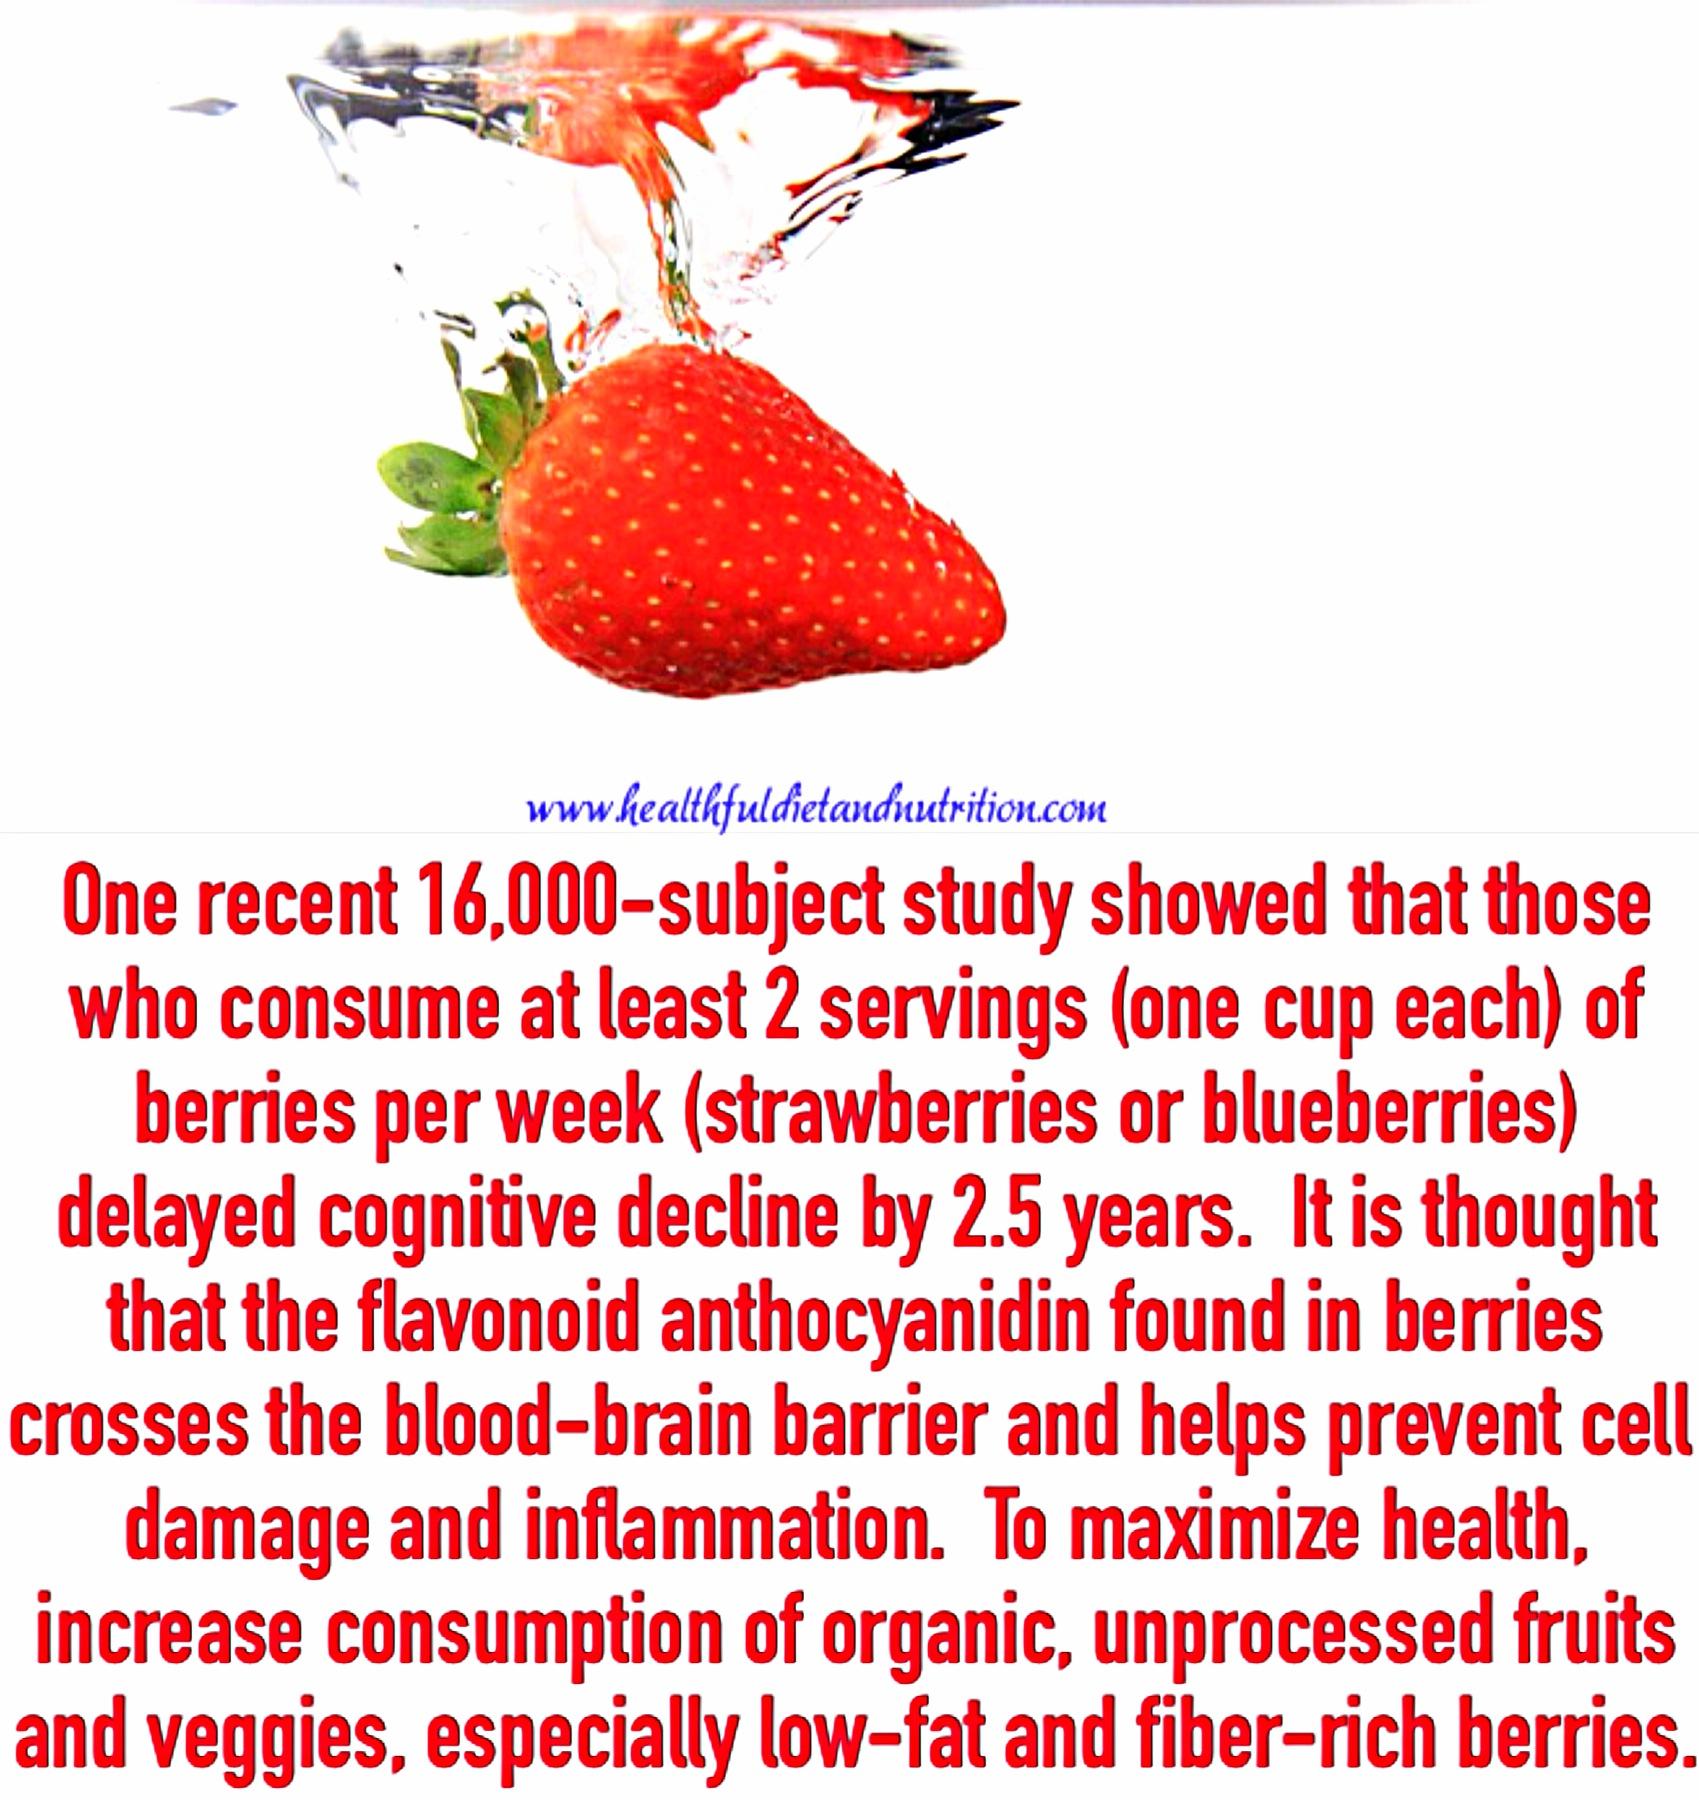 Consume Organic Fruits & Veggies to Maximize Health